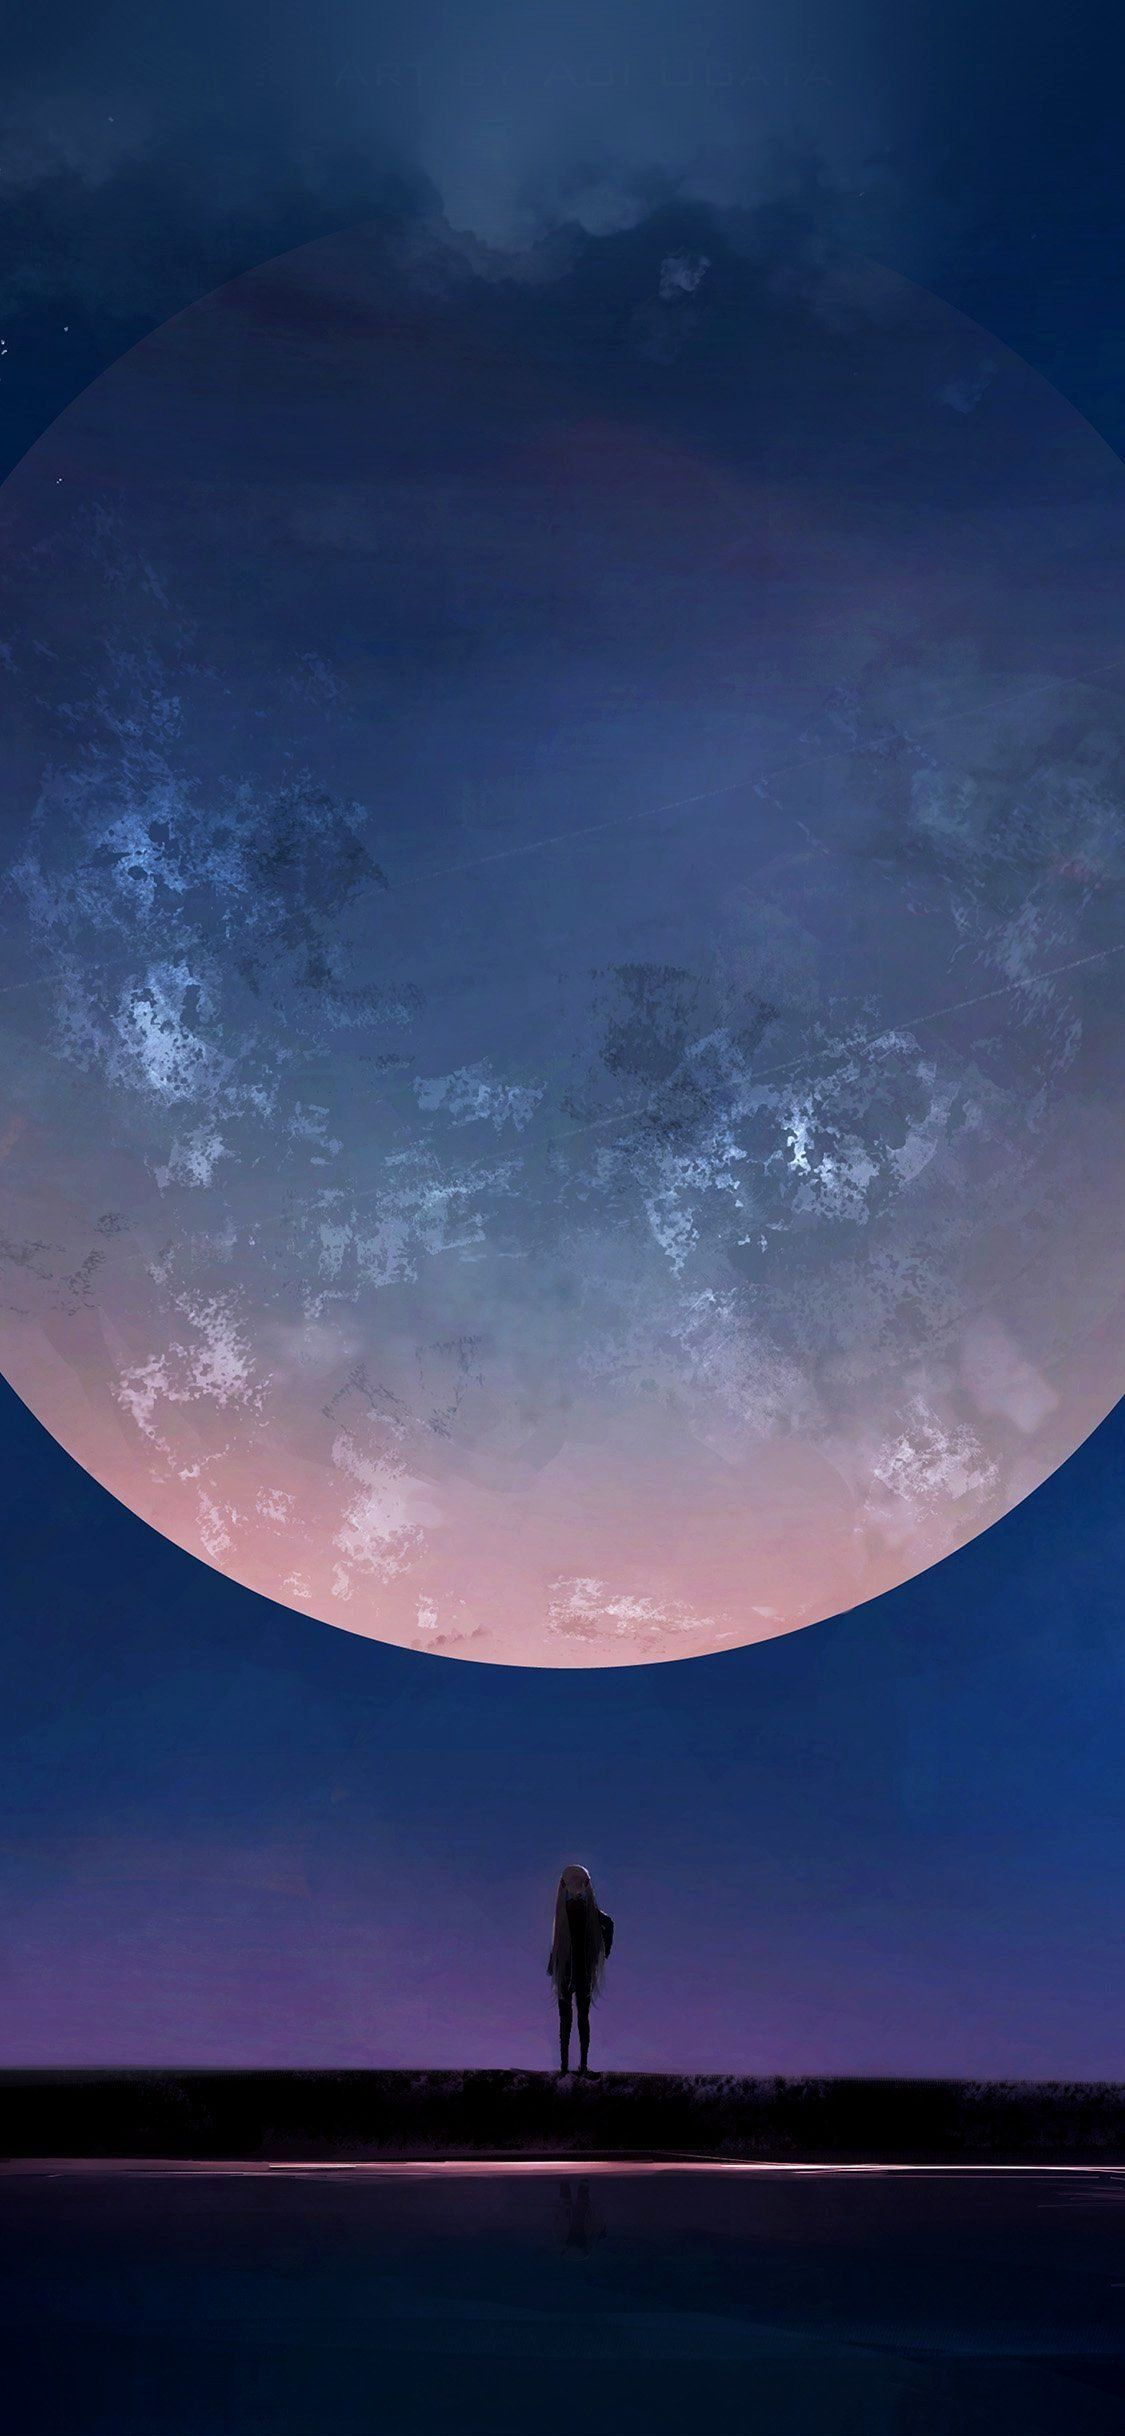 Night Sky Wallpaper 4k Iphone Trick Iphone Night Nightskyiphone Sky Trick Iphone Night Sky Tri In 2020 Night Sky Wallpaper Anime Wallpaper Download Night Art